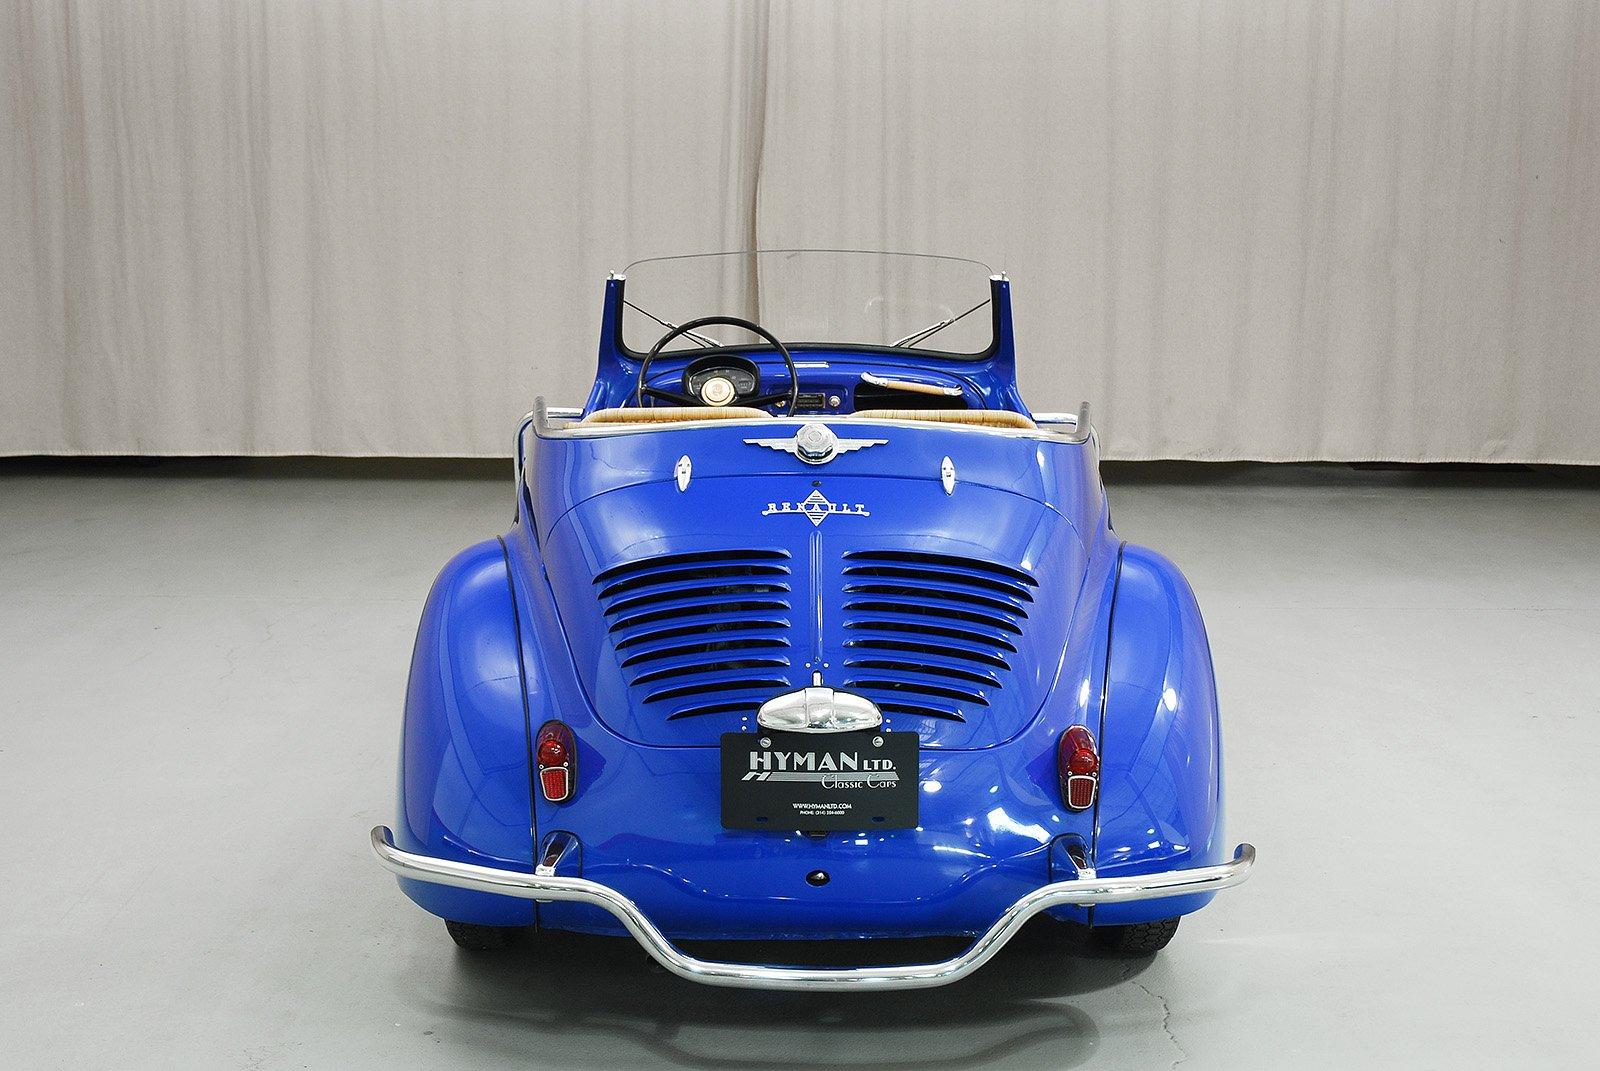 1961 Renault Jolly Beach Car Hyman Ltd Classic Cars